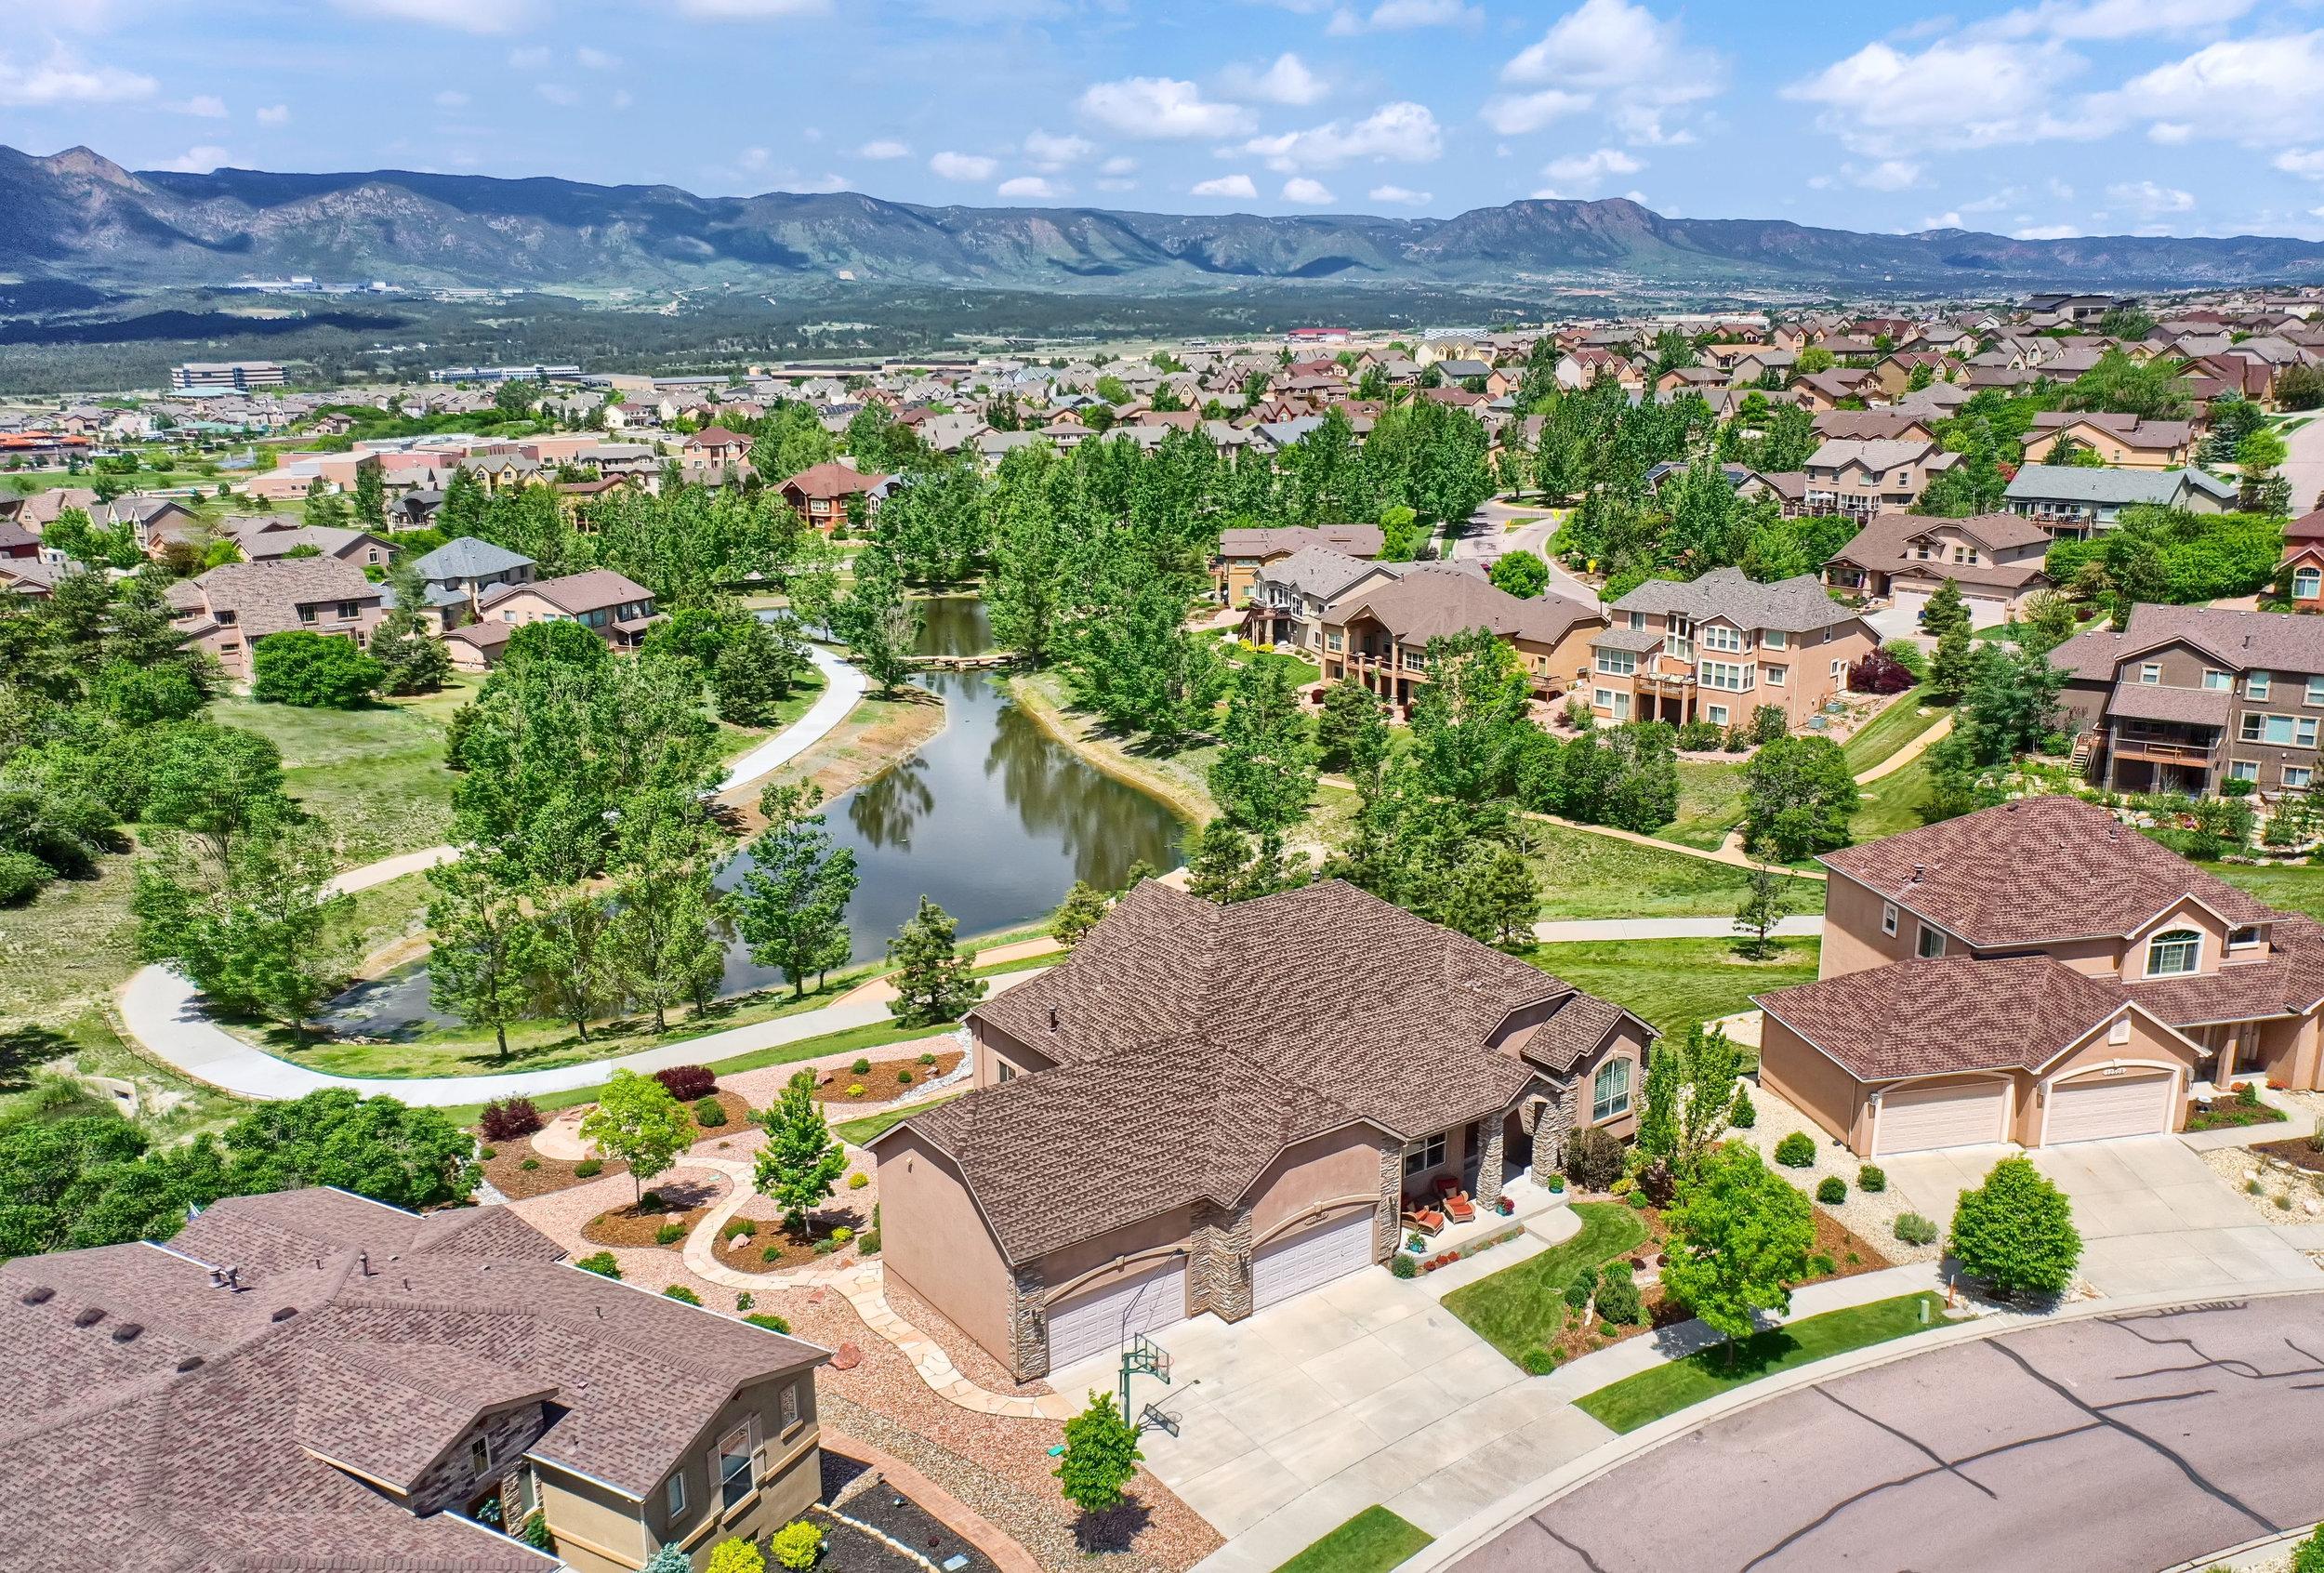 12496 Creekhurst Dr Colorado-print-007-037-Aerial-4200x2843-300dpi.jpg